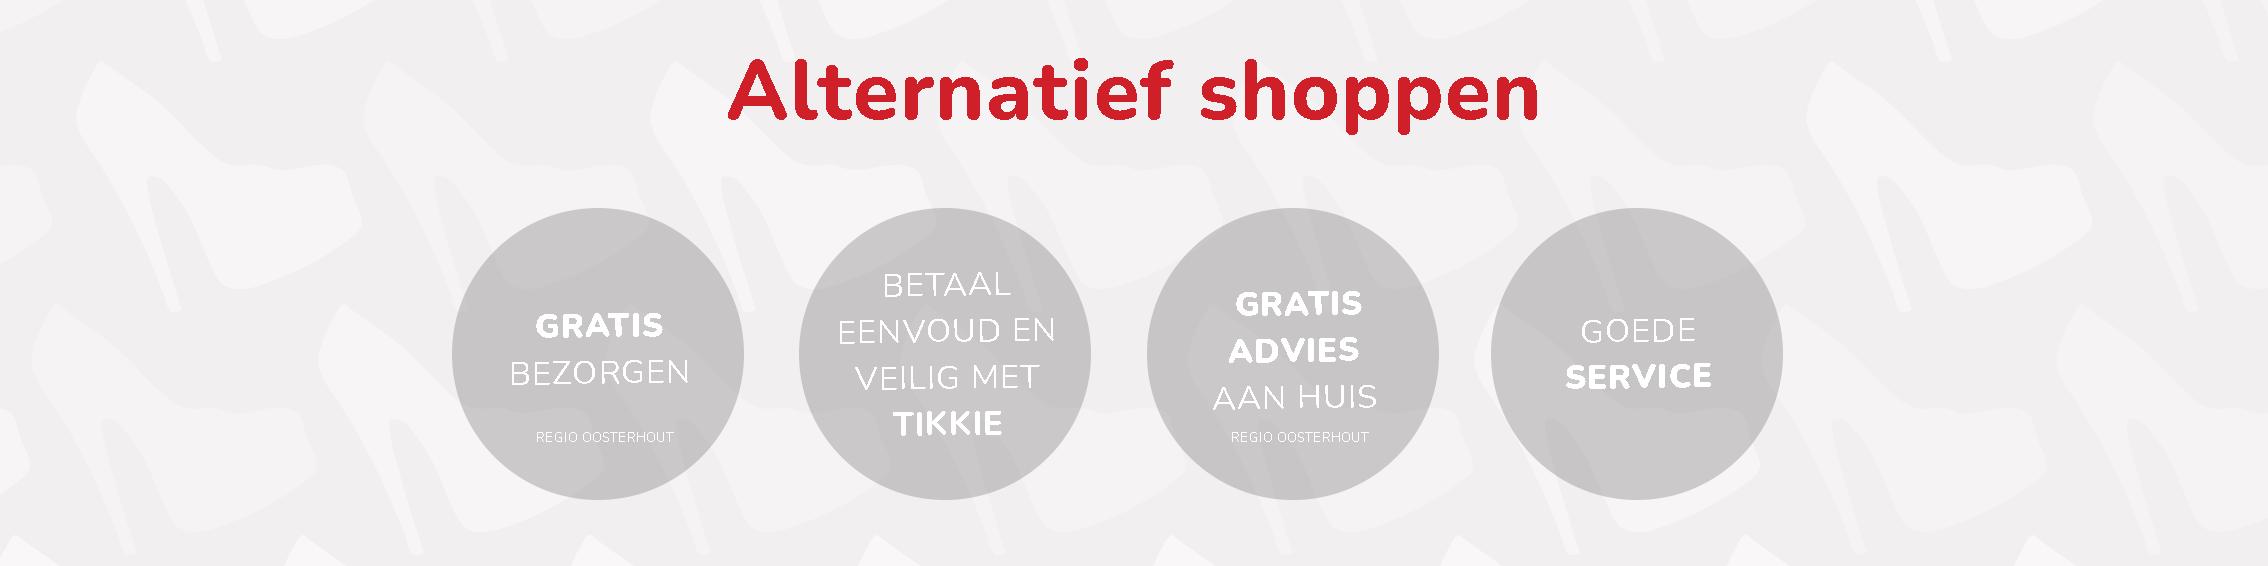 Alternatief shoppen